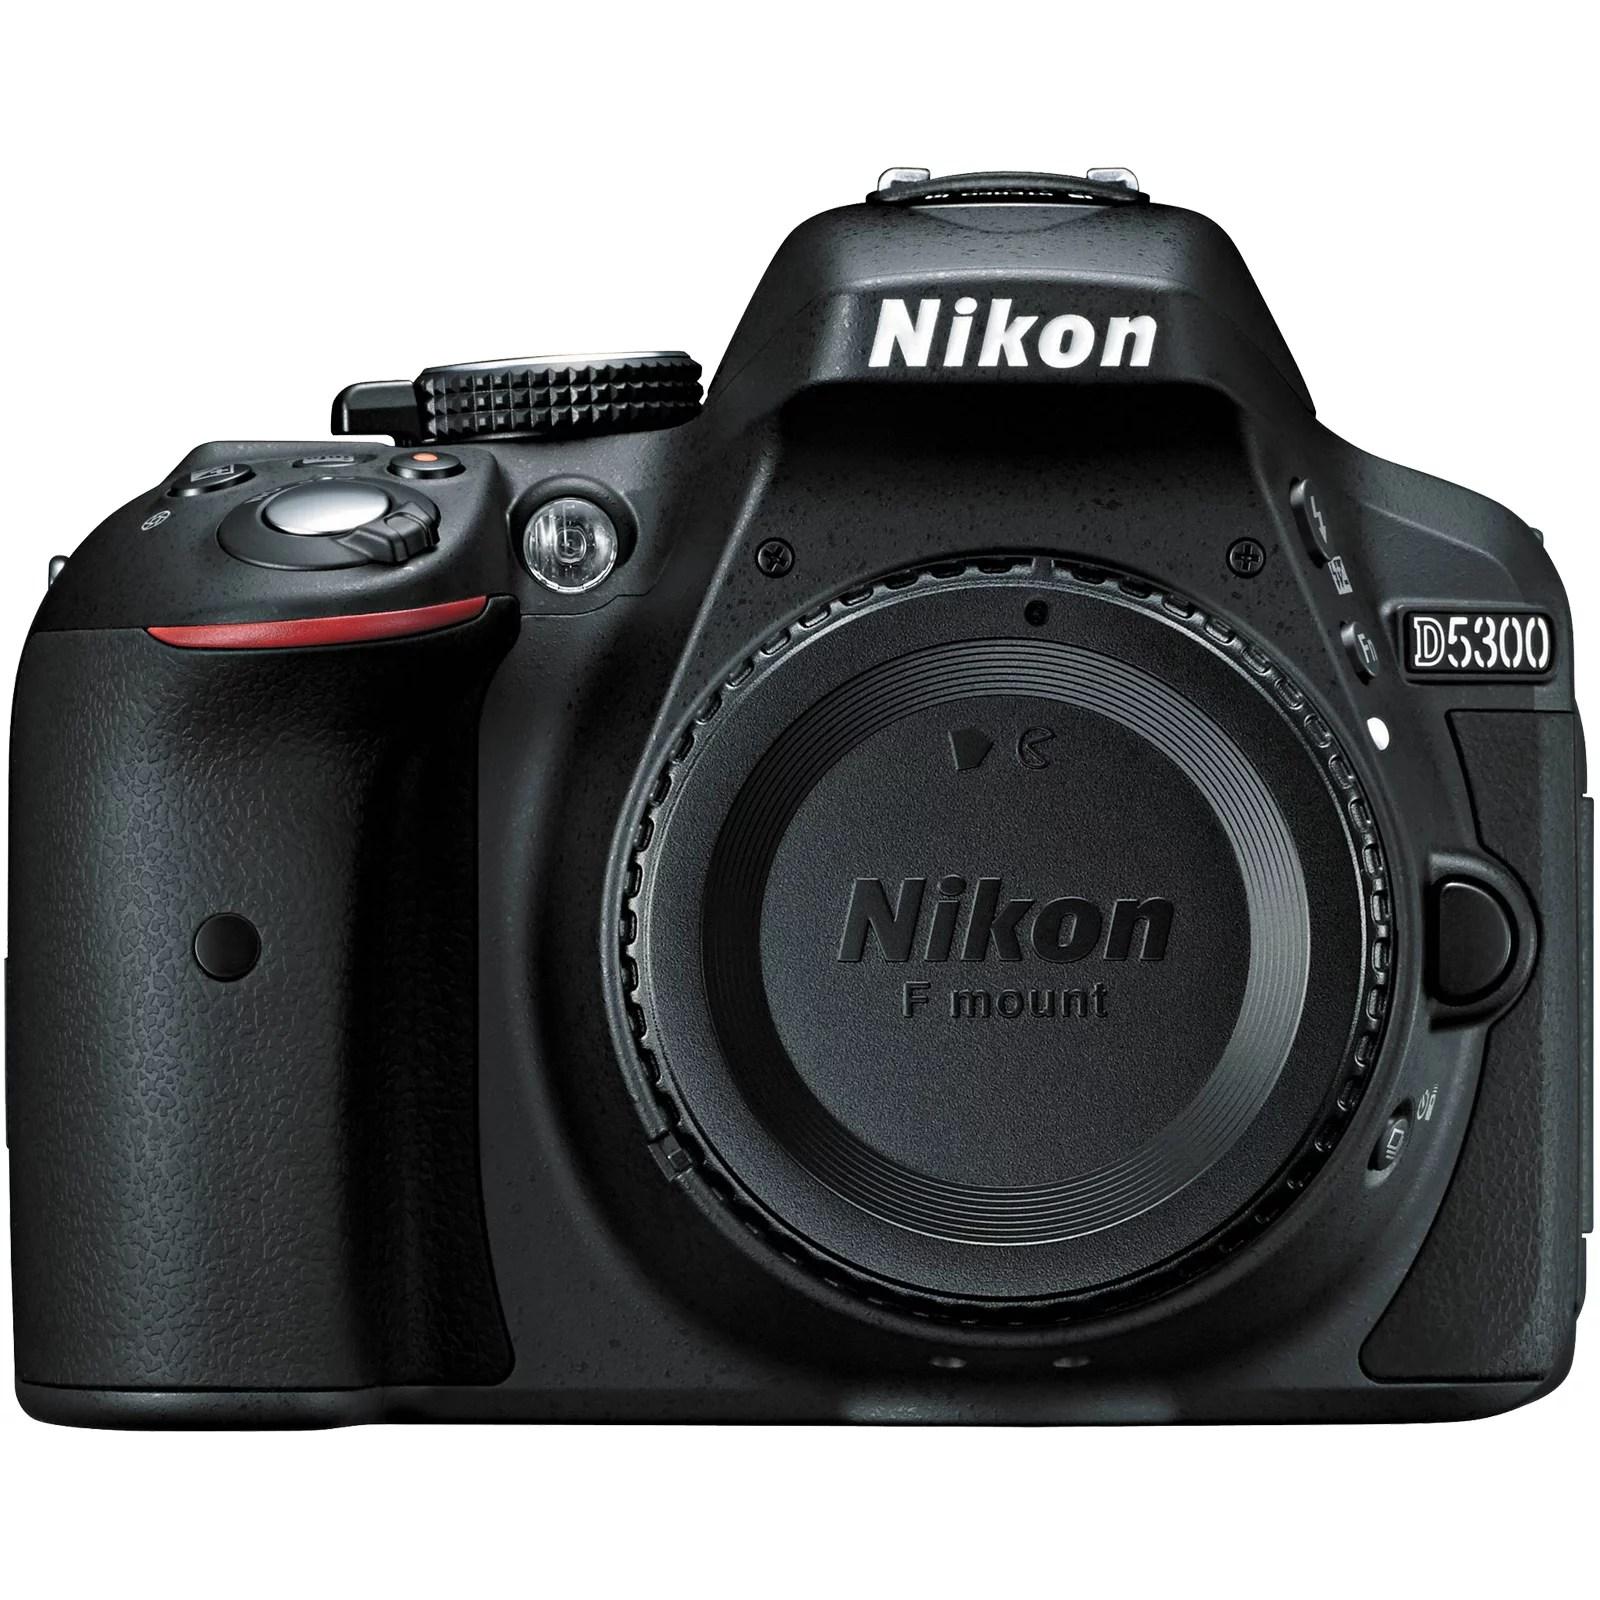 Nikon D5300 – Digital camera – SLR – 24.2 MP – APS-C – body only – Wi-Fi – black